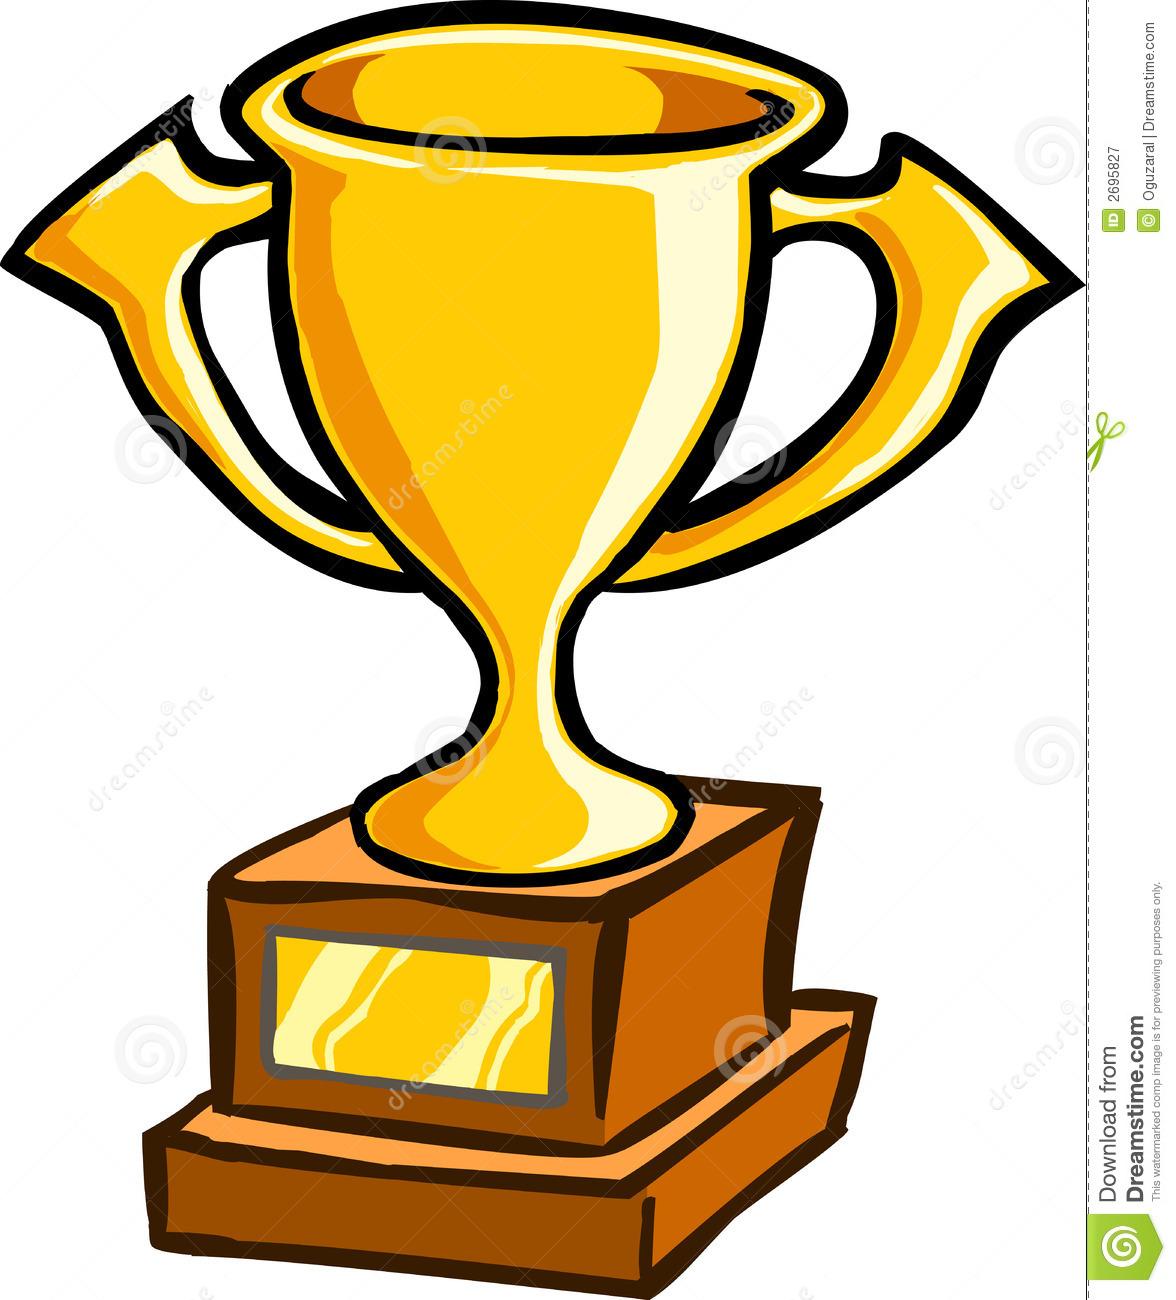 1176x1300 Trophy Clipart Golden Cup